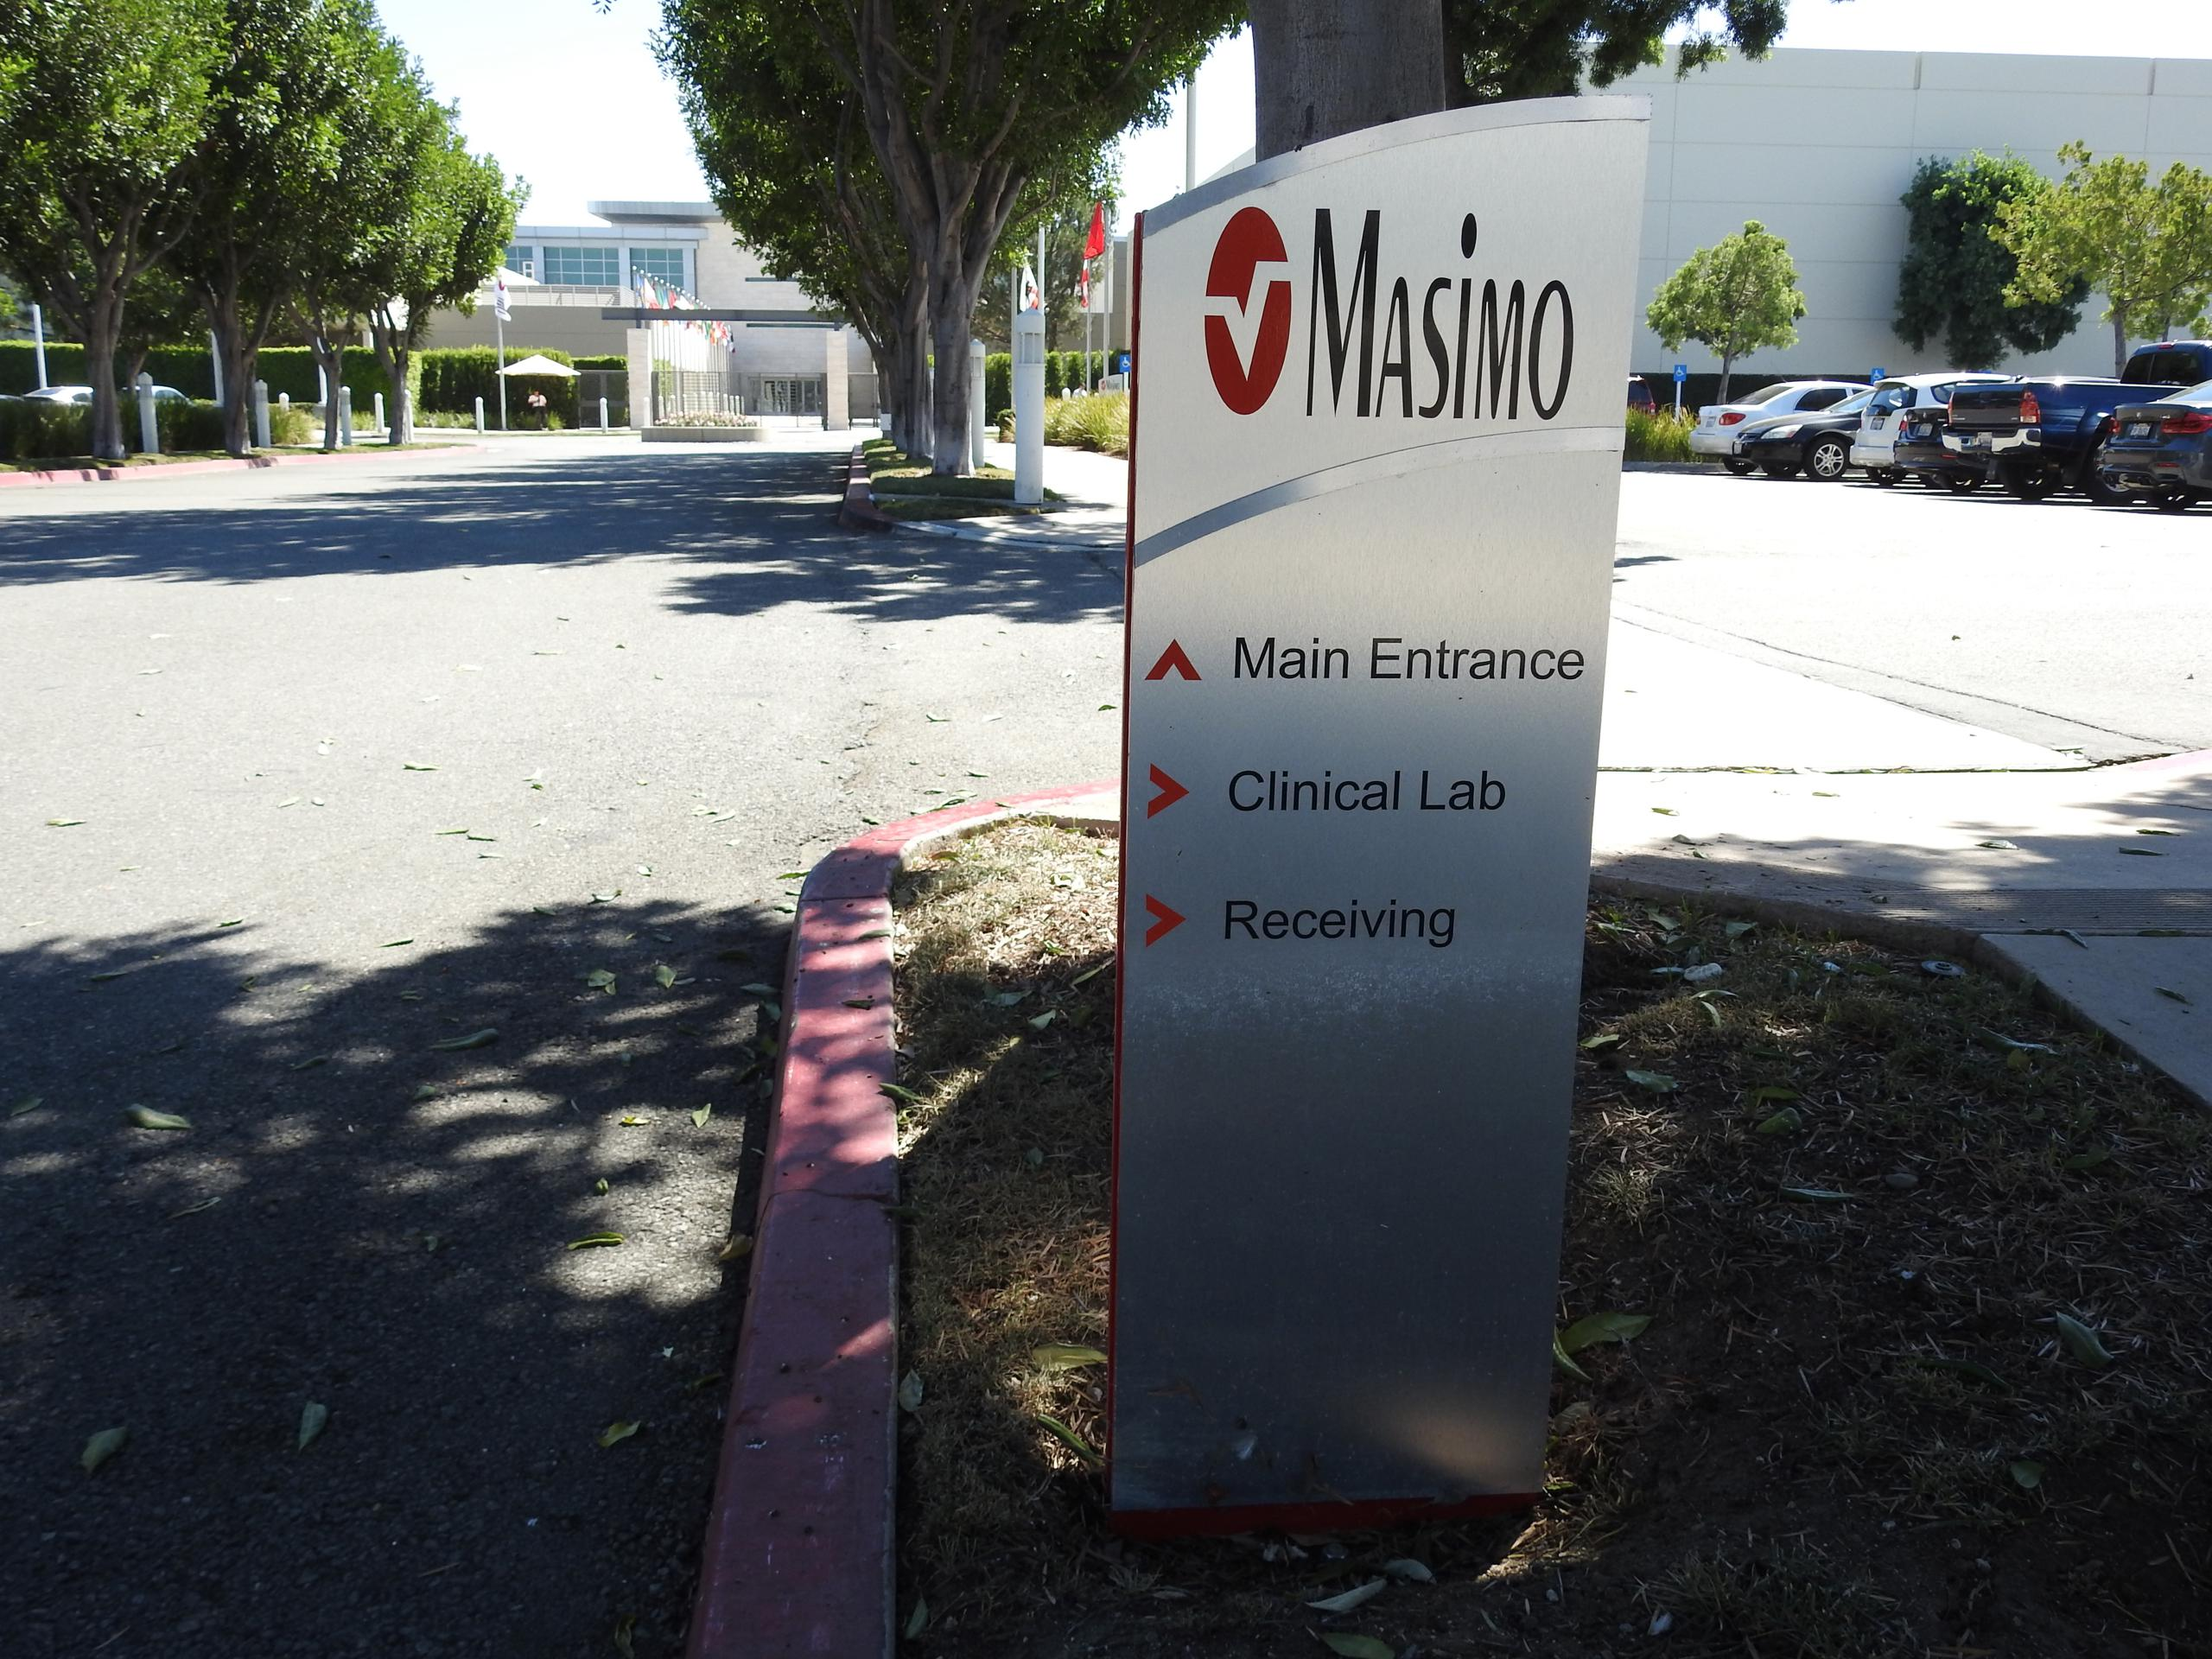 Entrance to Masimo's corporate headquarters in Irvine, California.